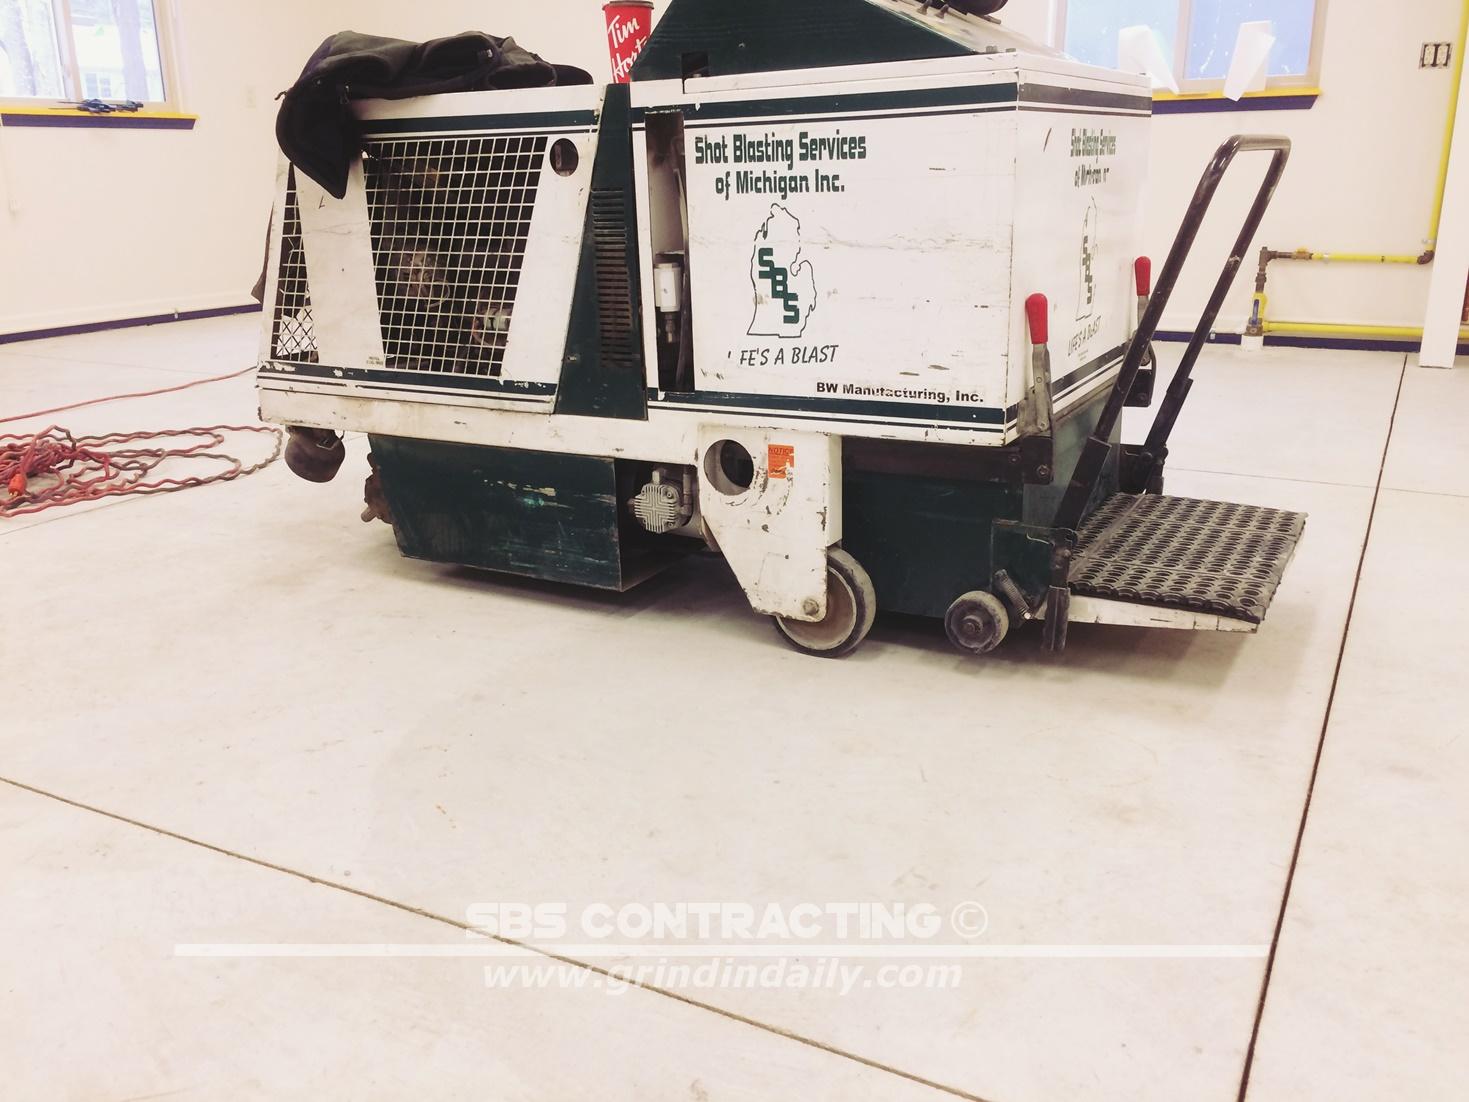 SBS-Contracting-Pole-Barn-Floor-Project-Before-01-2018-03